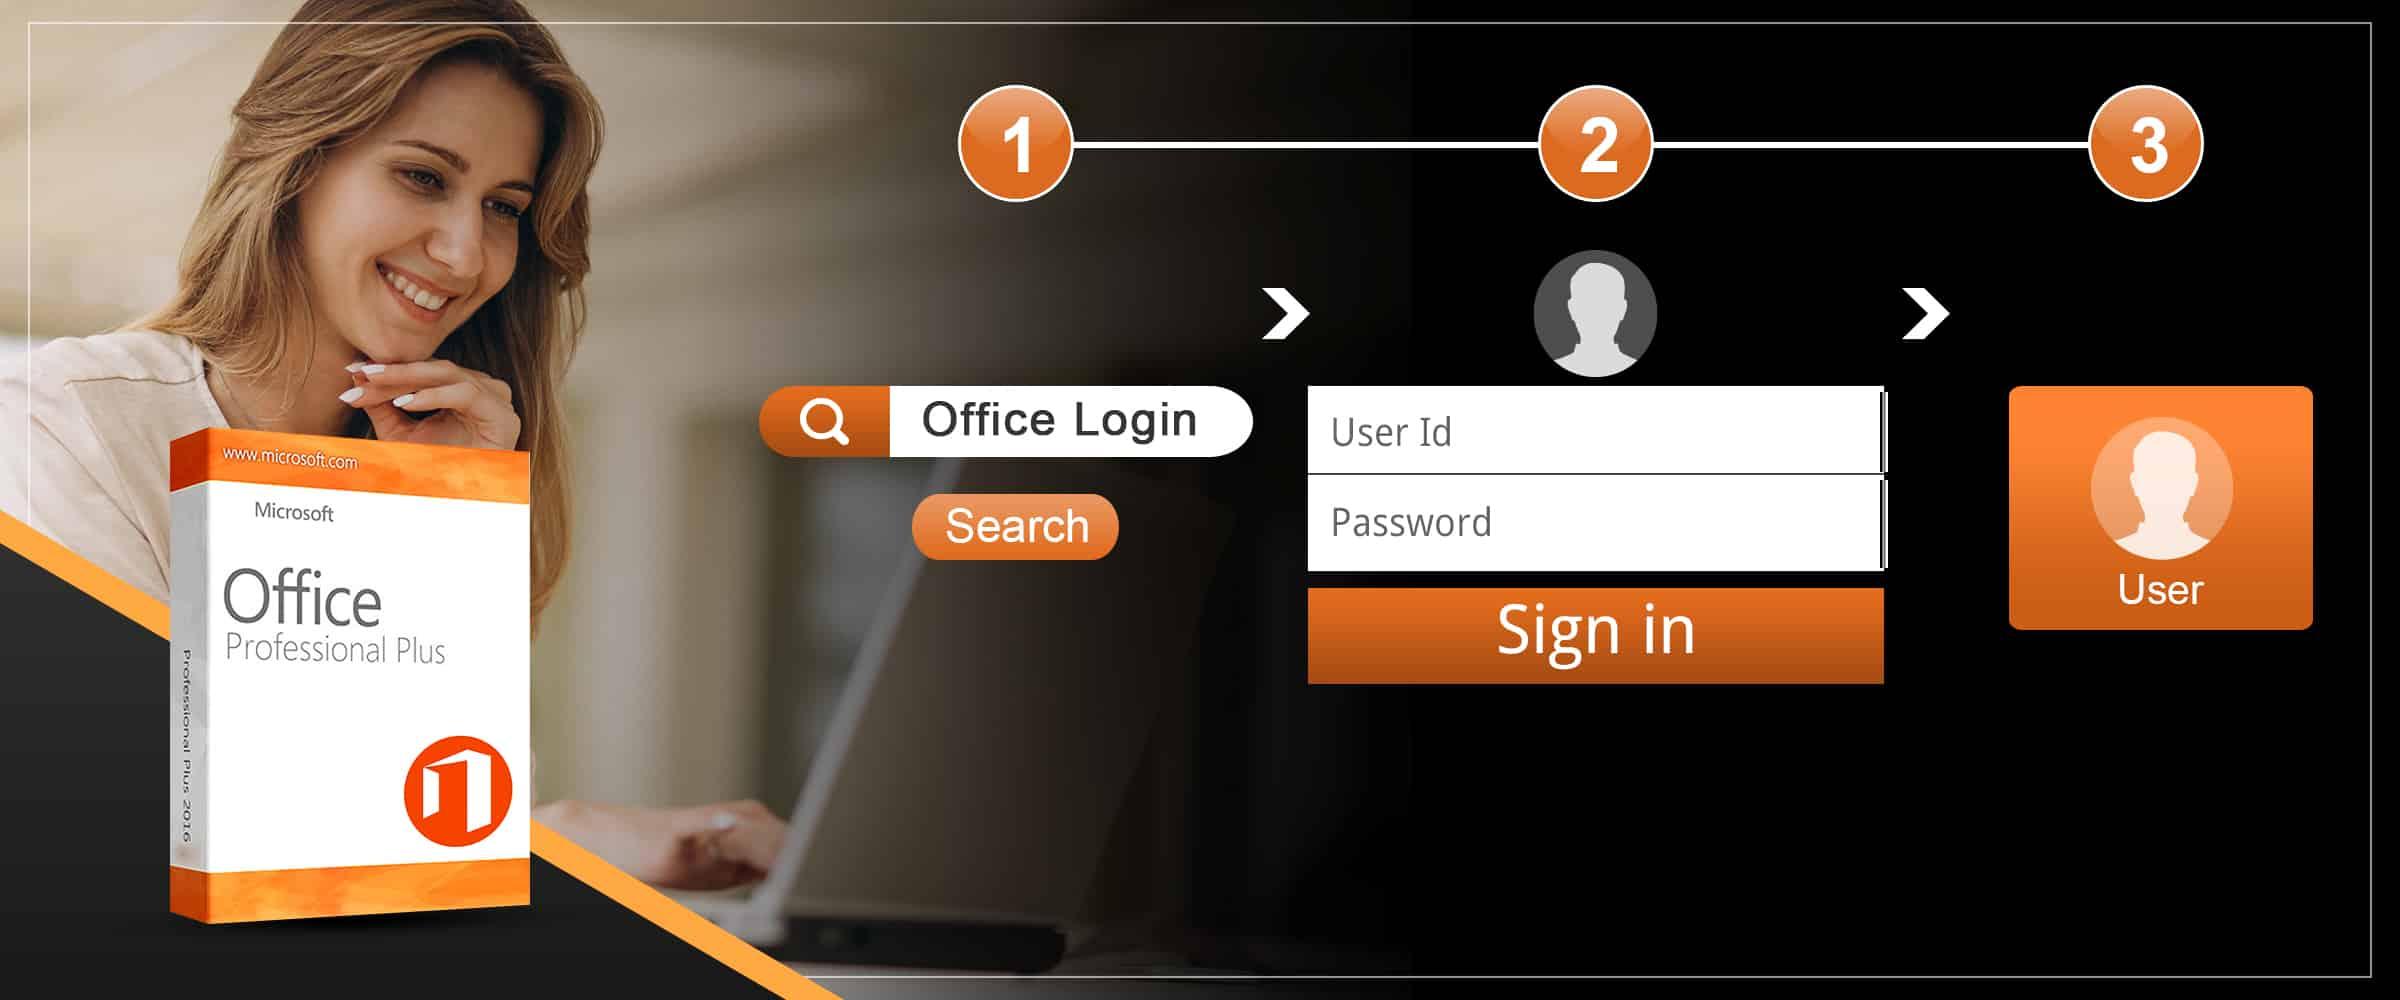 Office Login : MS Office login | Office.com/myaccount